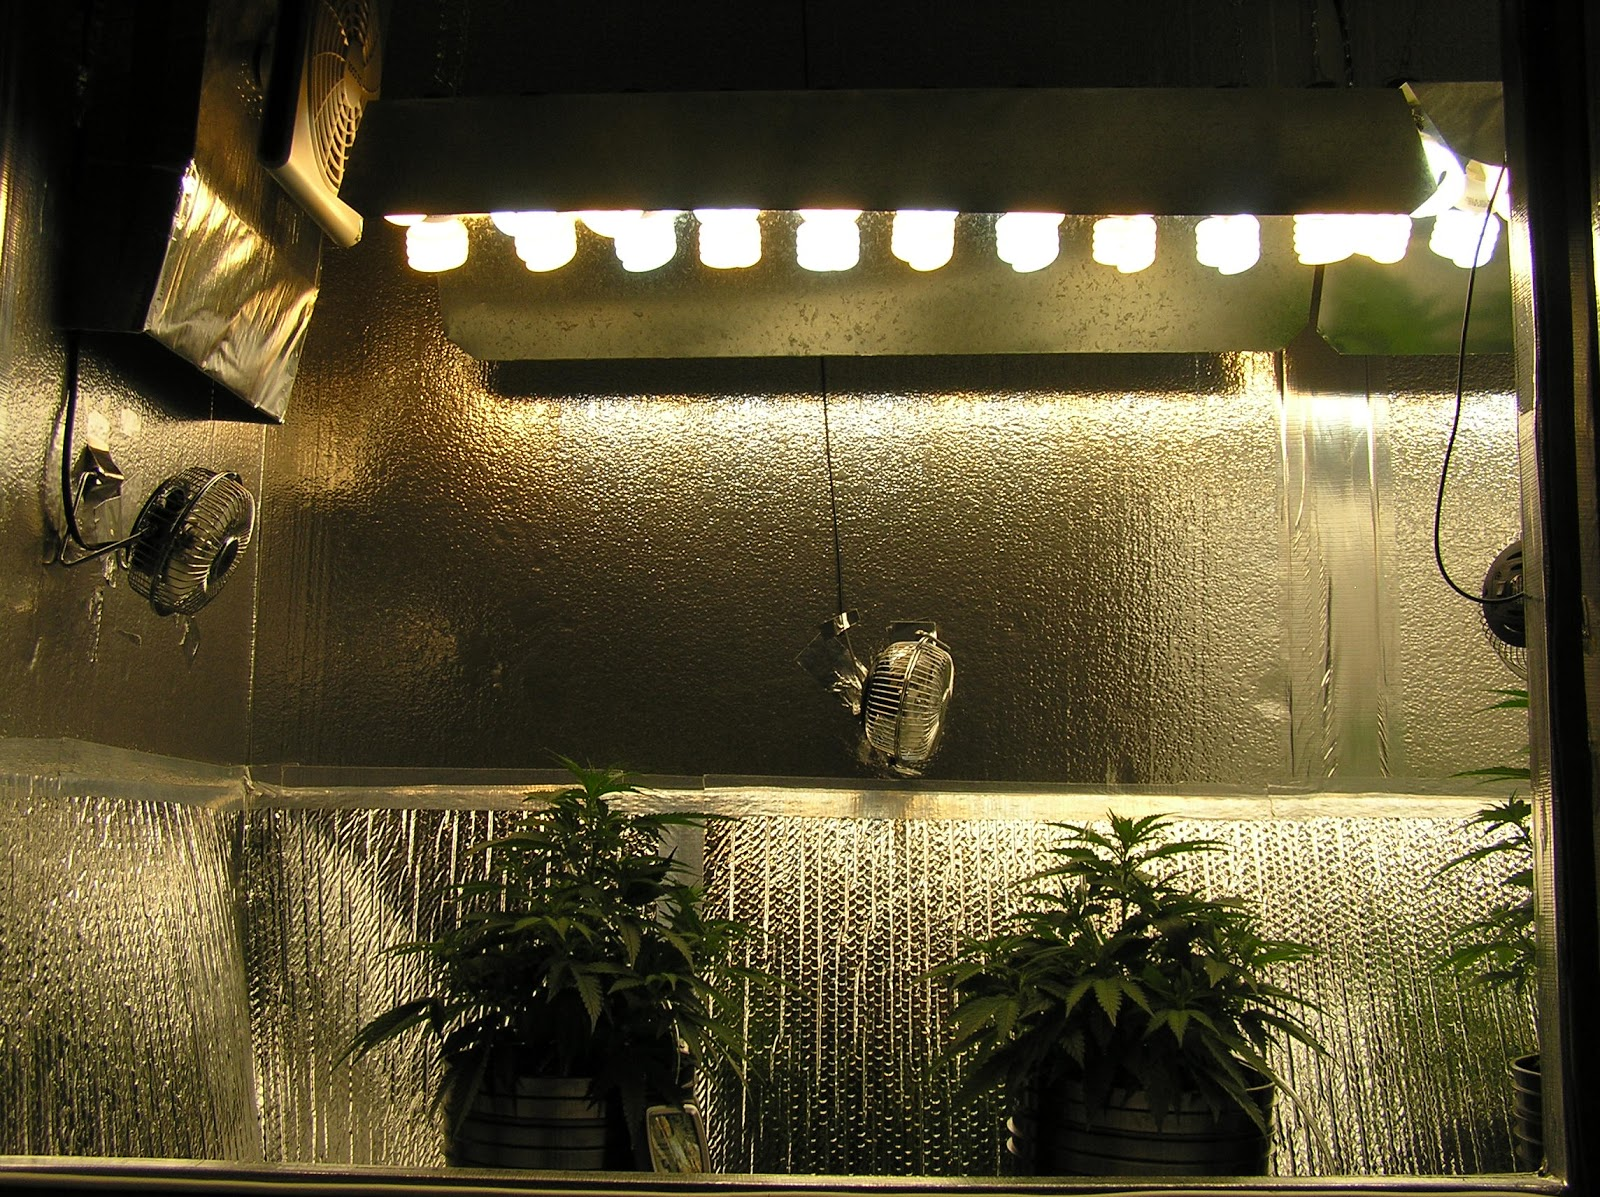 alternative weed grow light types led vs cfl 39 s. Black Bedroom Furniture Sets. Home Design Ideas